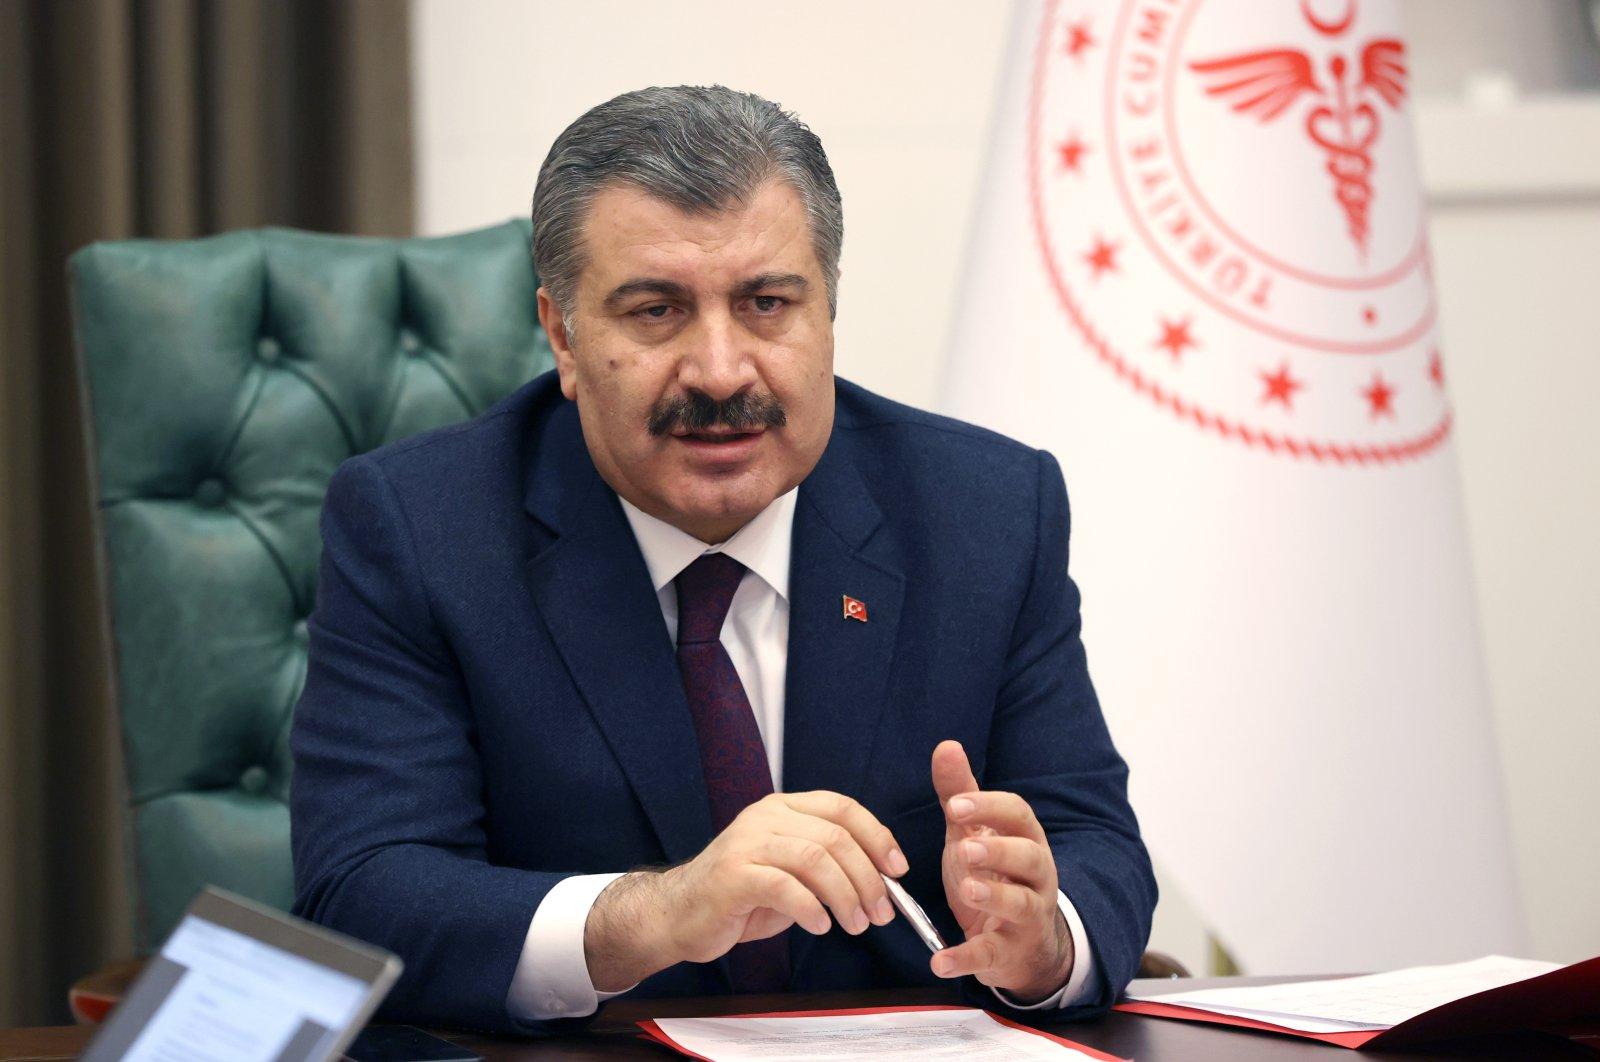 Turkish Health Minister Fahrettin Koca speaks at a press conference in Ankara, Turkey, April 11, 2020. (AA Photo)